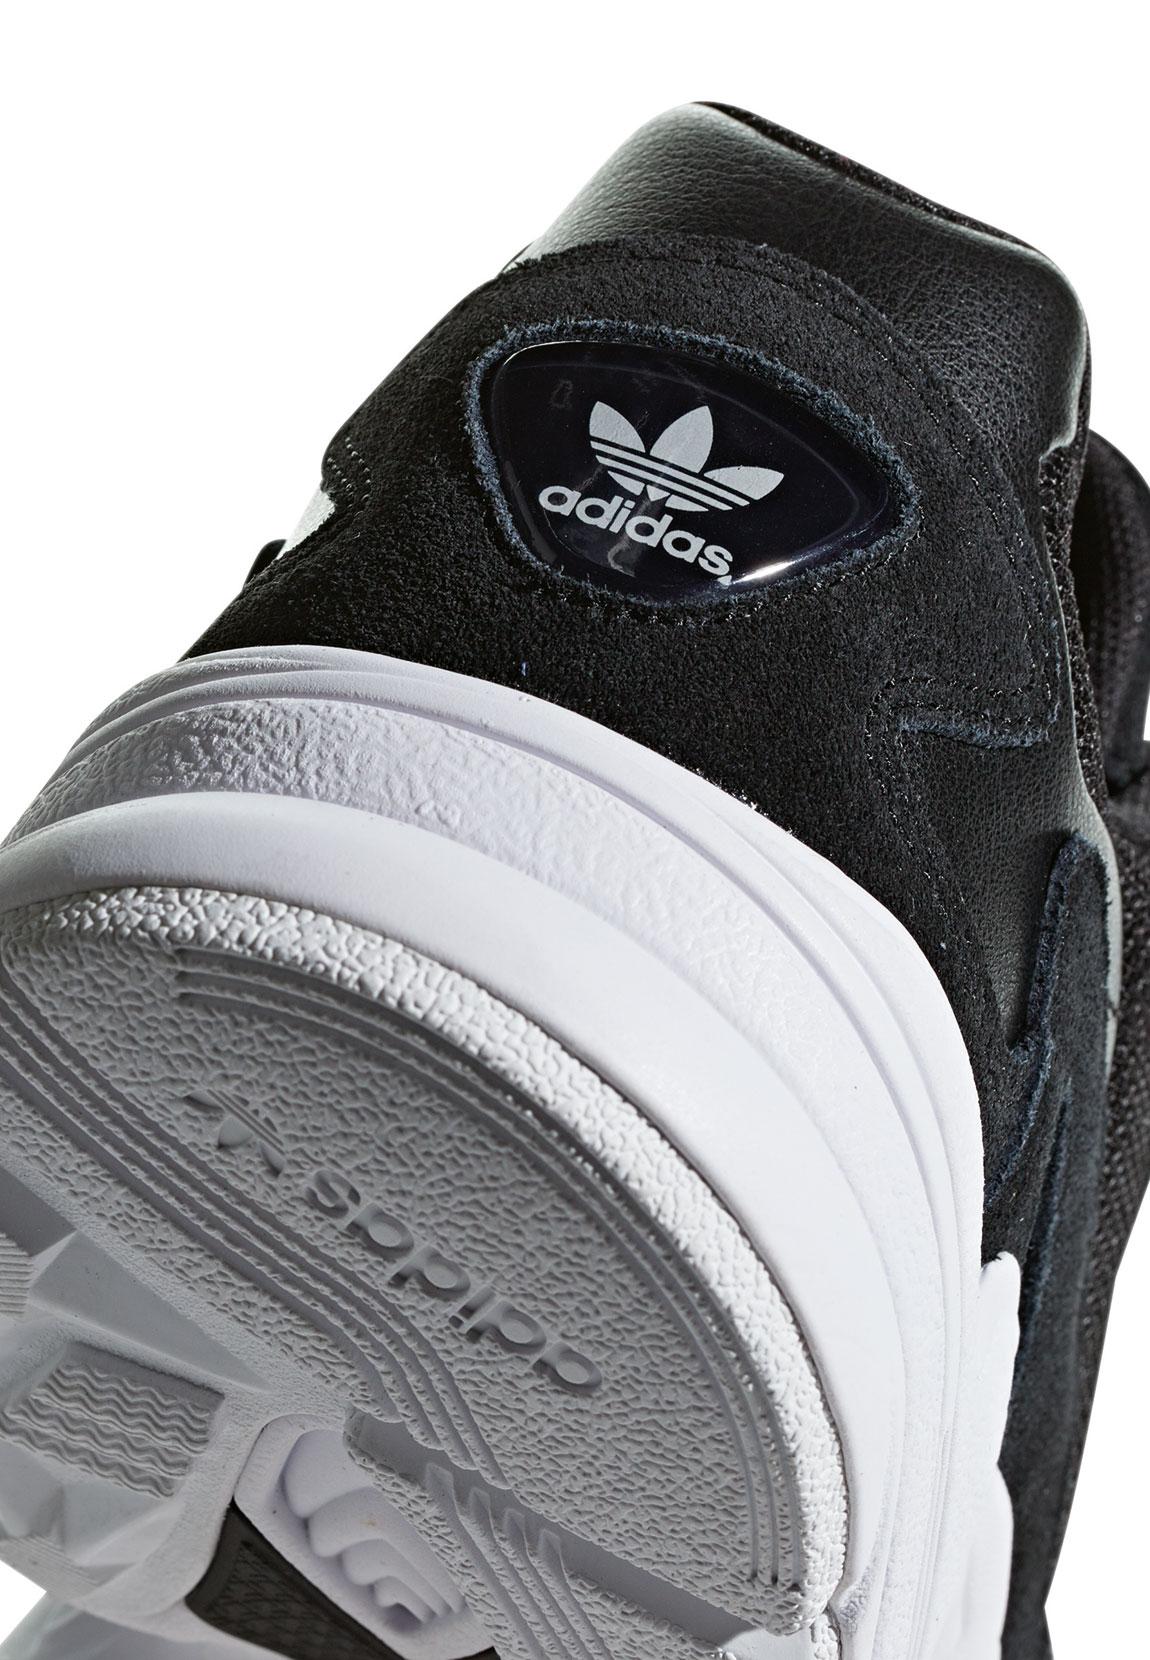 Details about Adidas Originals Sneaker Falcon W B28129 Black